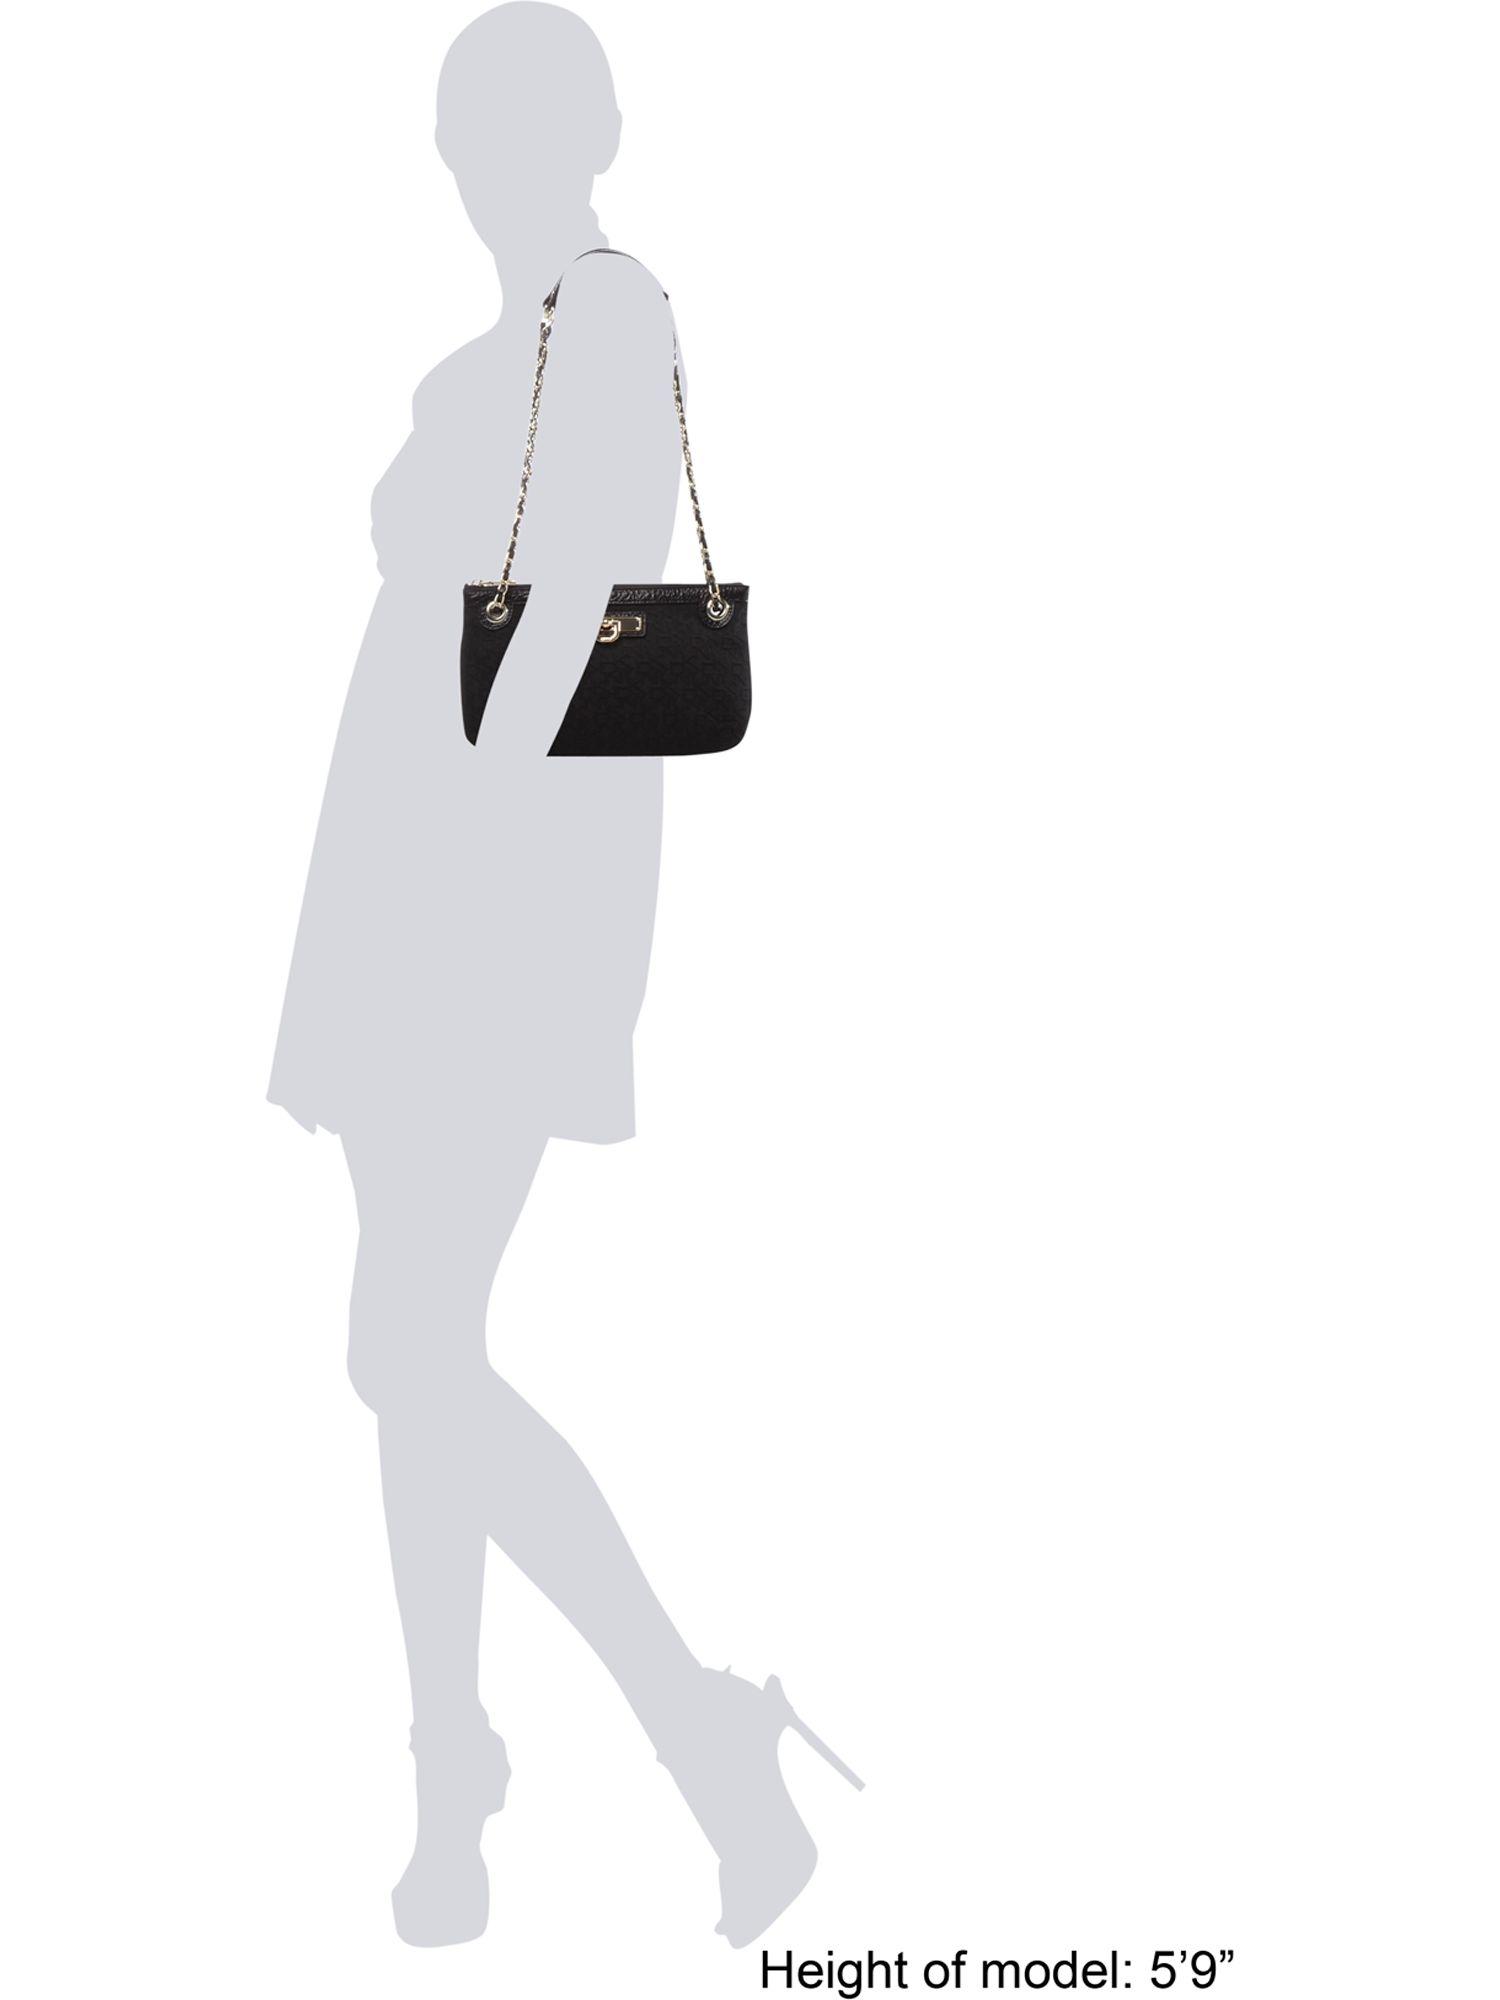 DKNY Item Crossbody Bag in Black